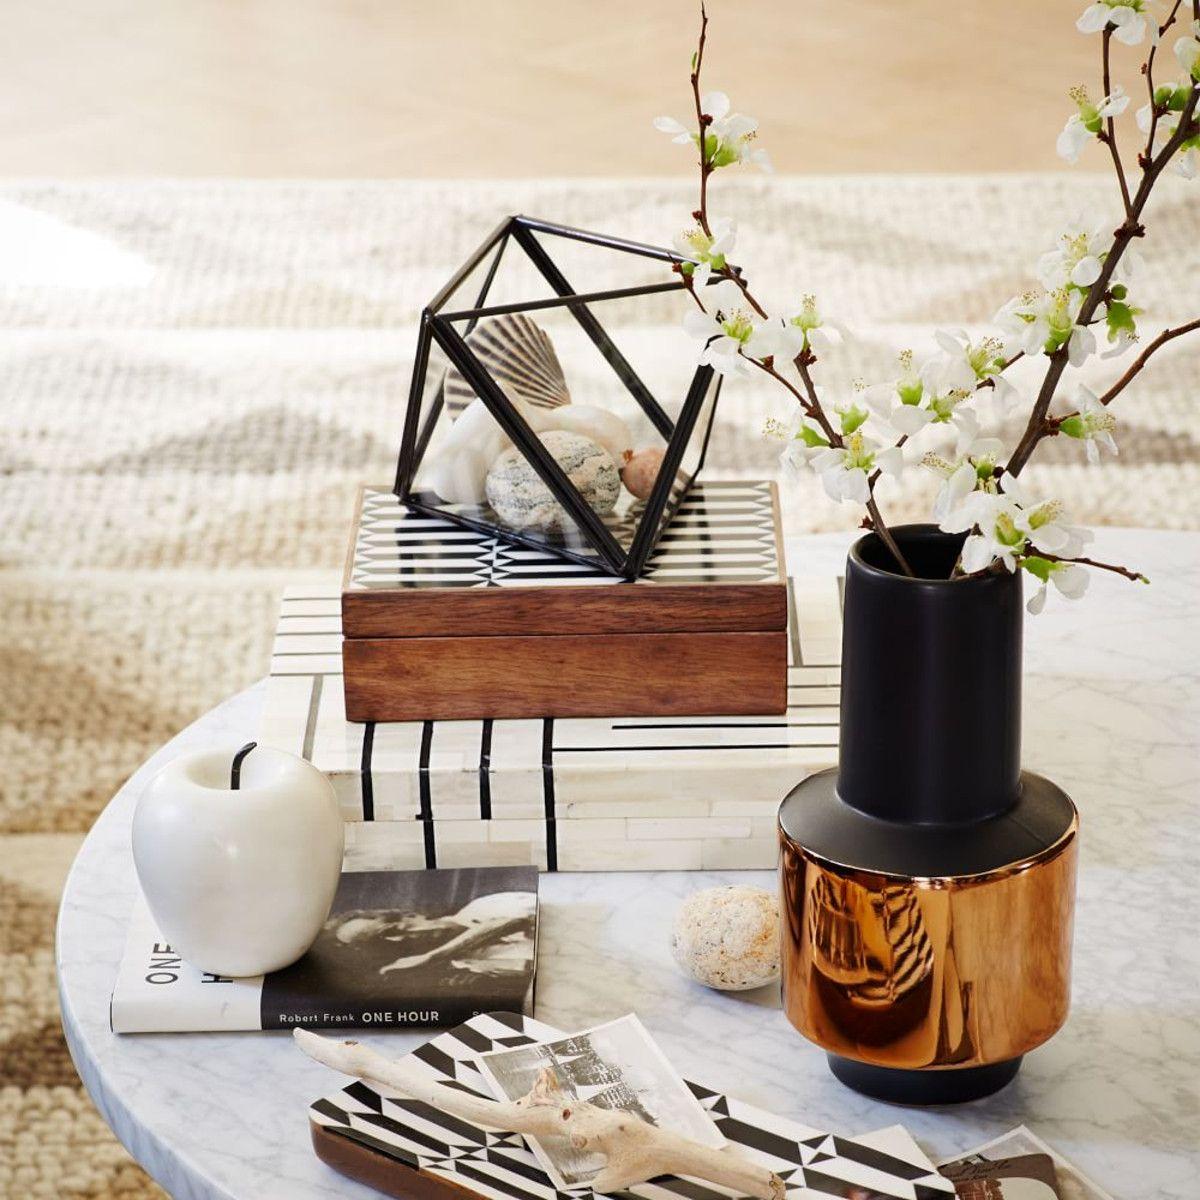 Faceted Terrariums Glass shadow box, Earthy decor, Decor